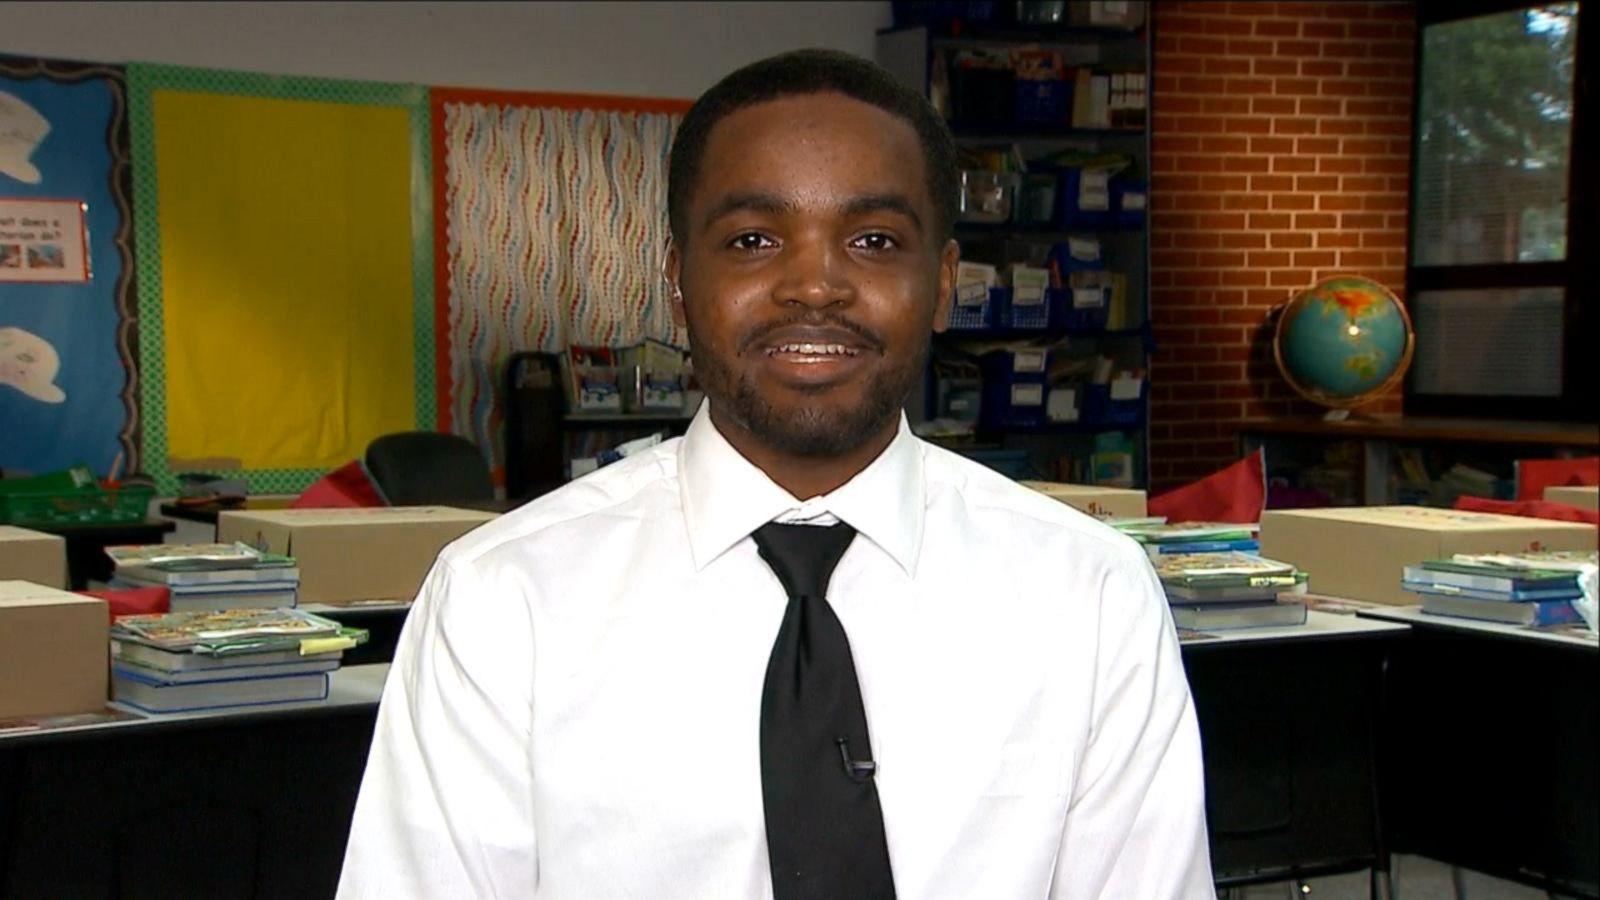 VIDEO: Chicago Teacher Creates Back to School Rap Song